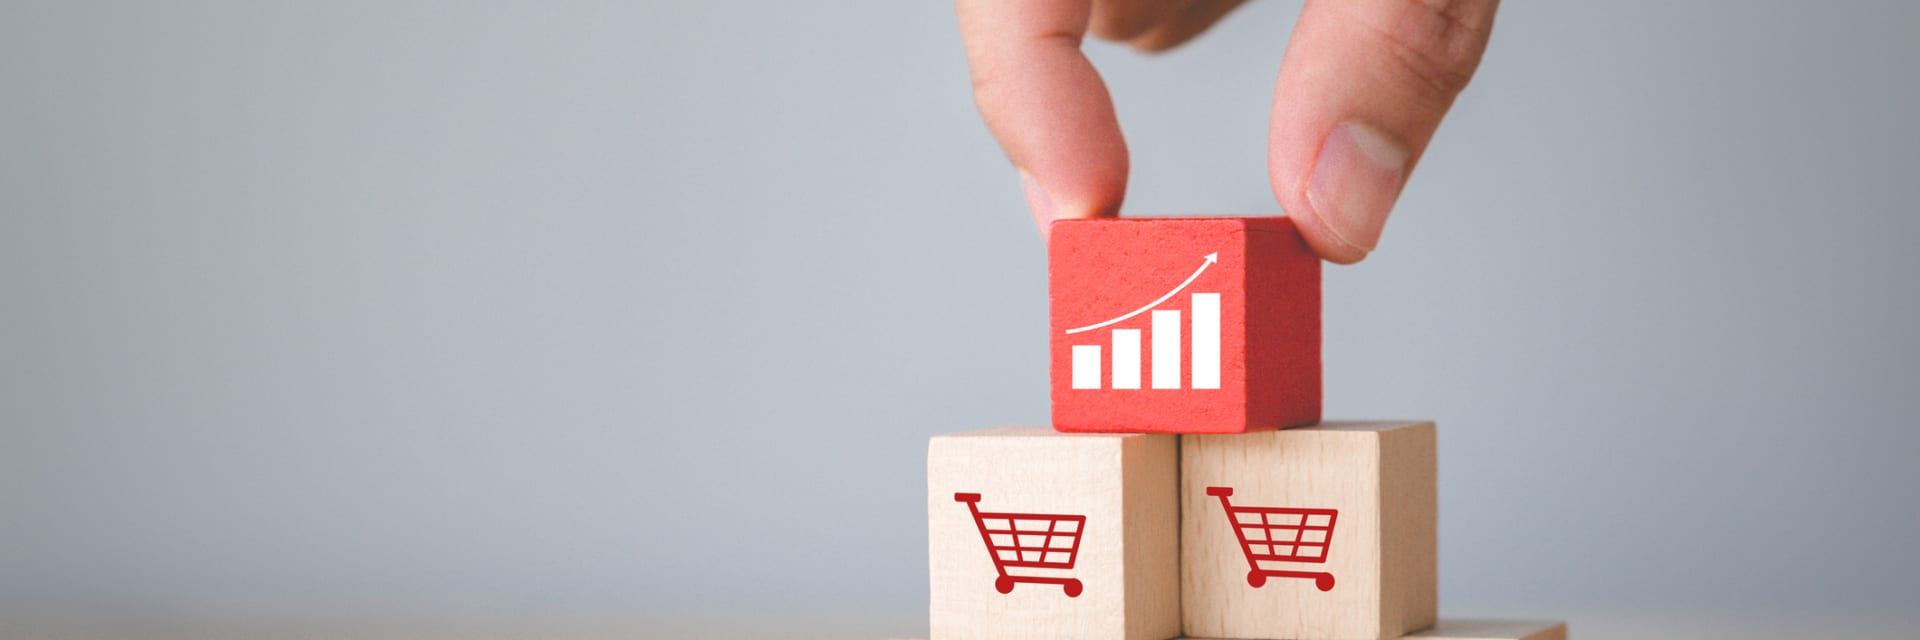 VMI (Vendor Managed Inventory)